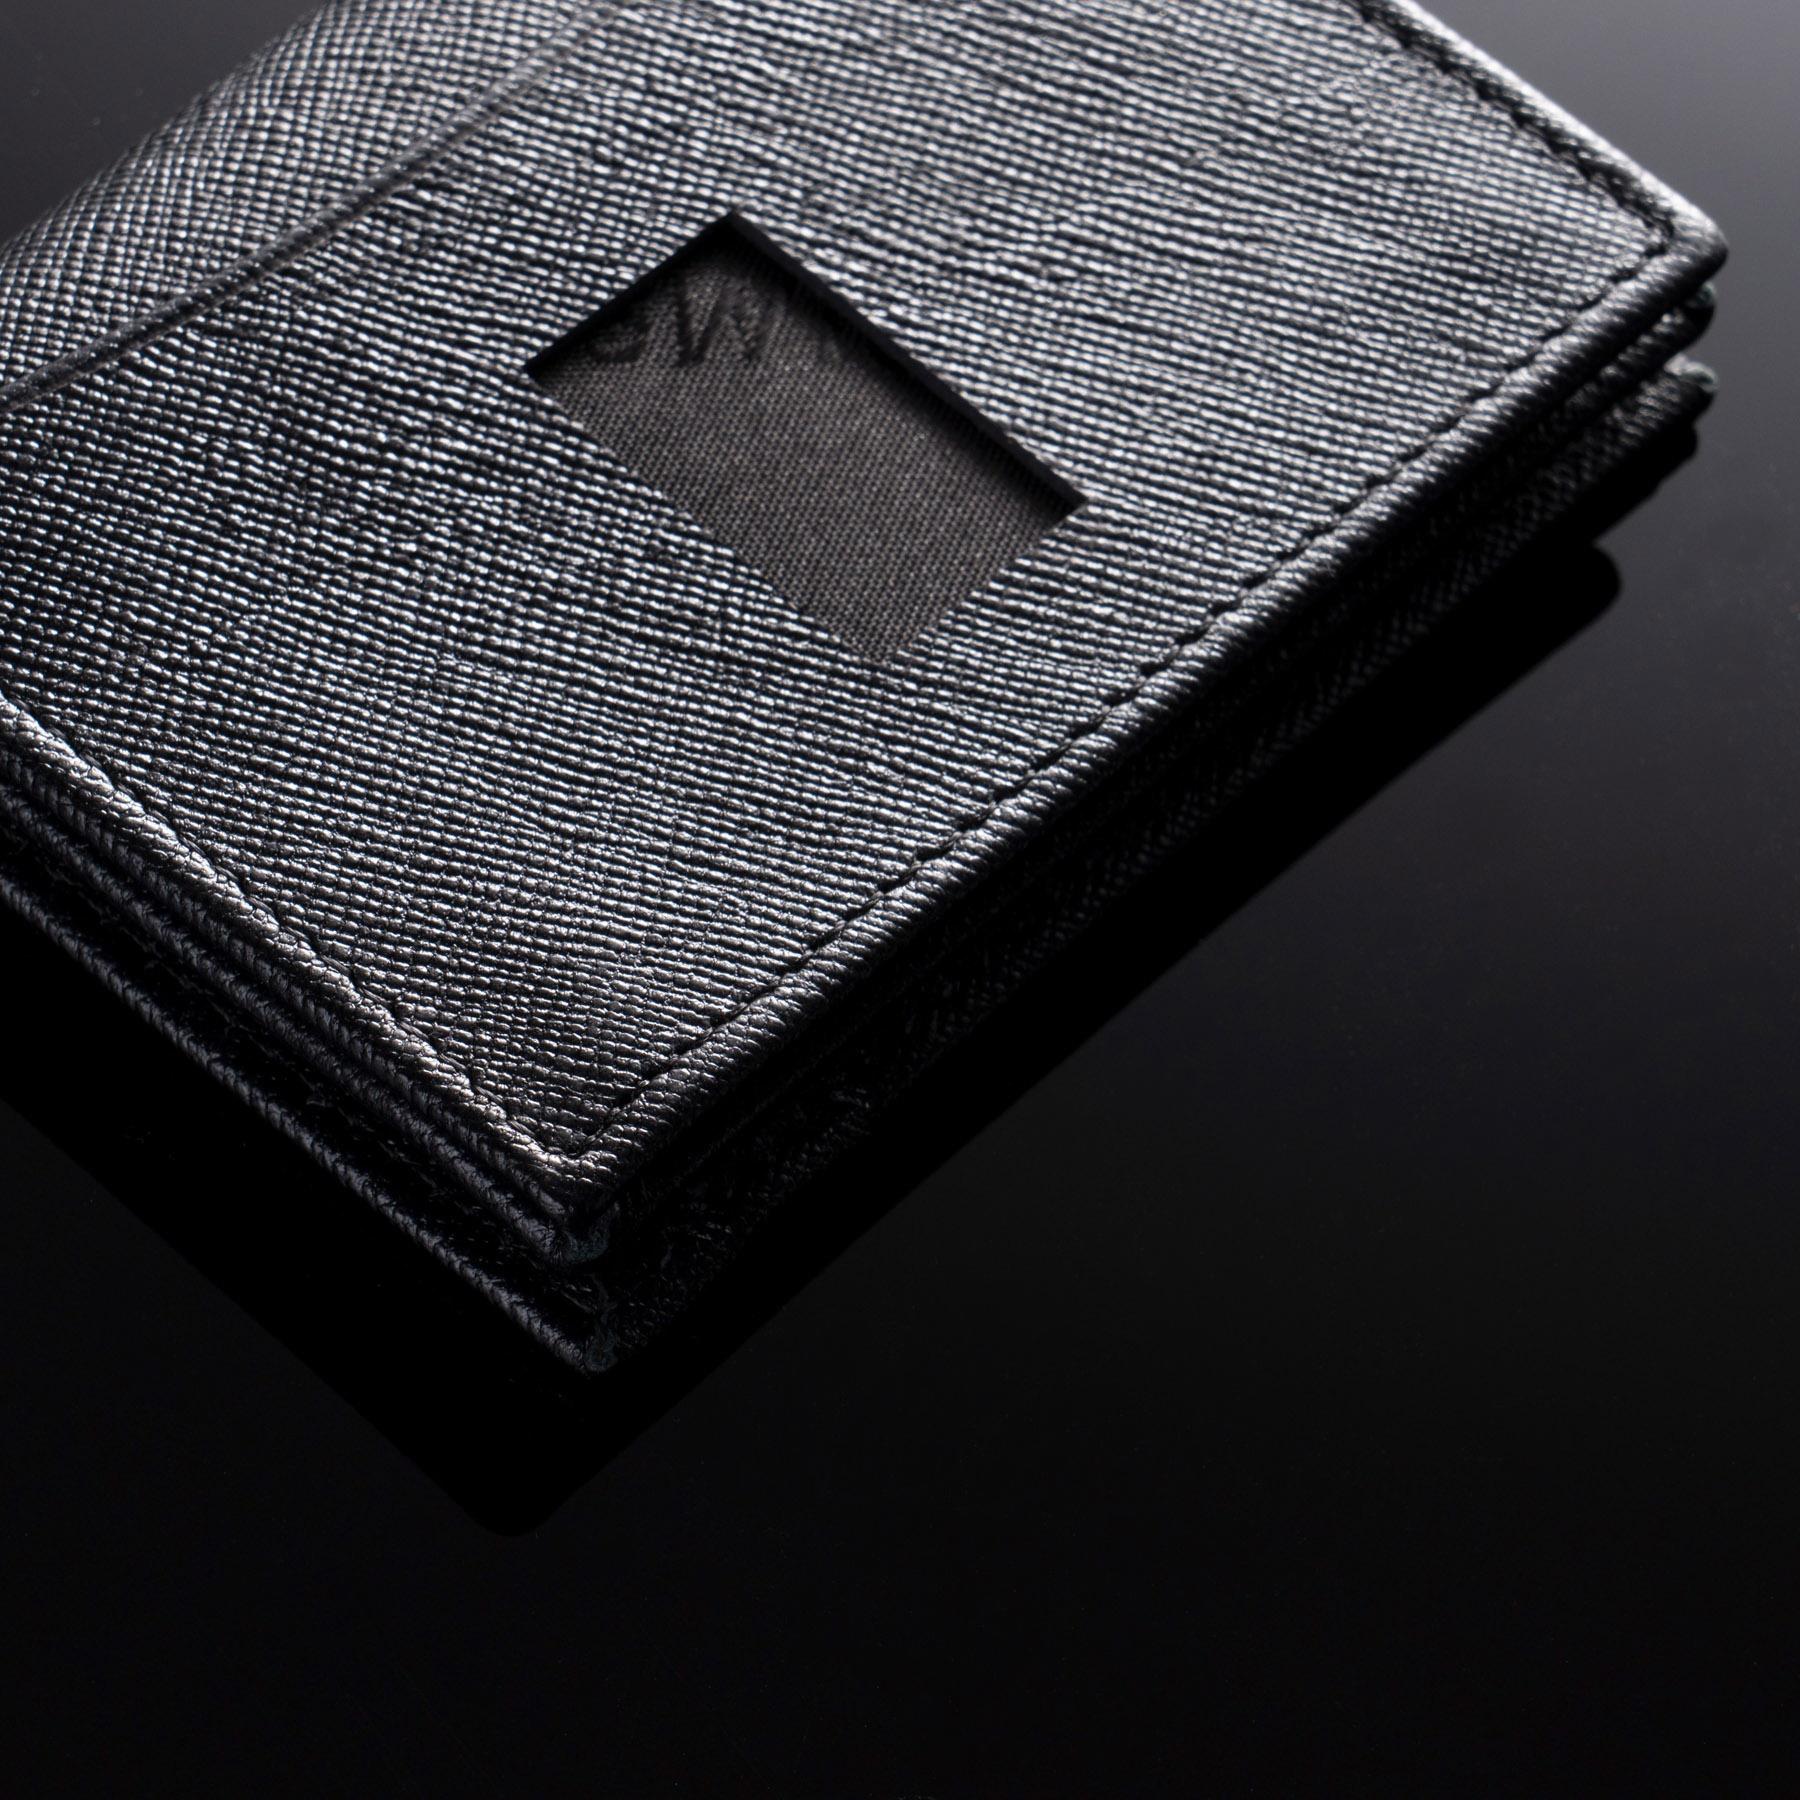 Alpine-Swiss-RFID-Leather-Business-Card-Wallet-Minimalist-ID-Window-Card-Holder thumbnail 35